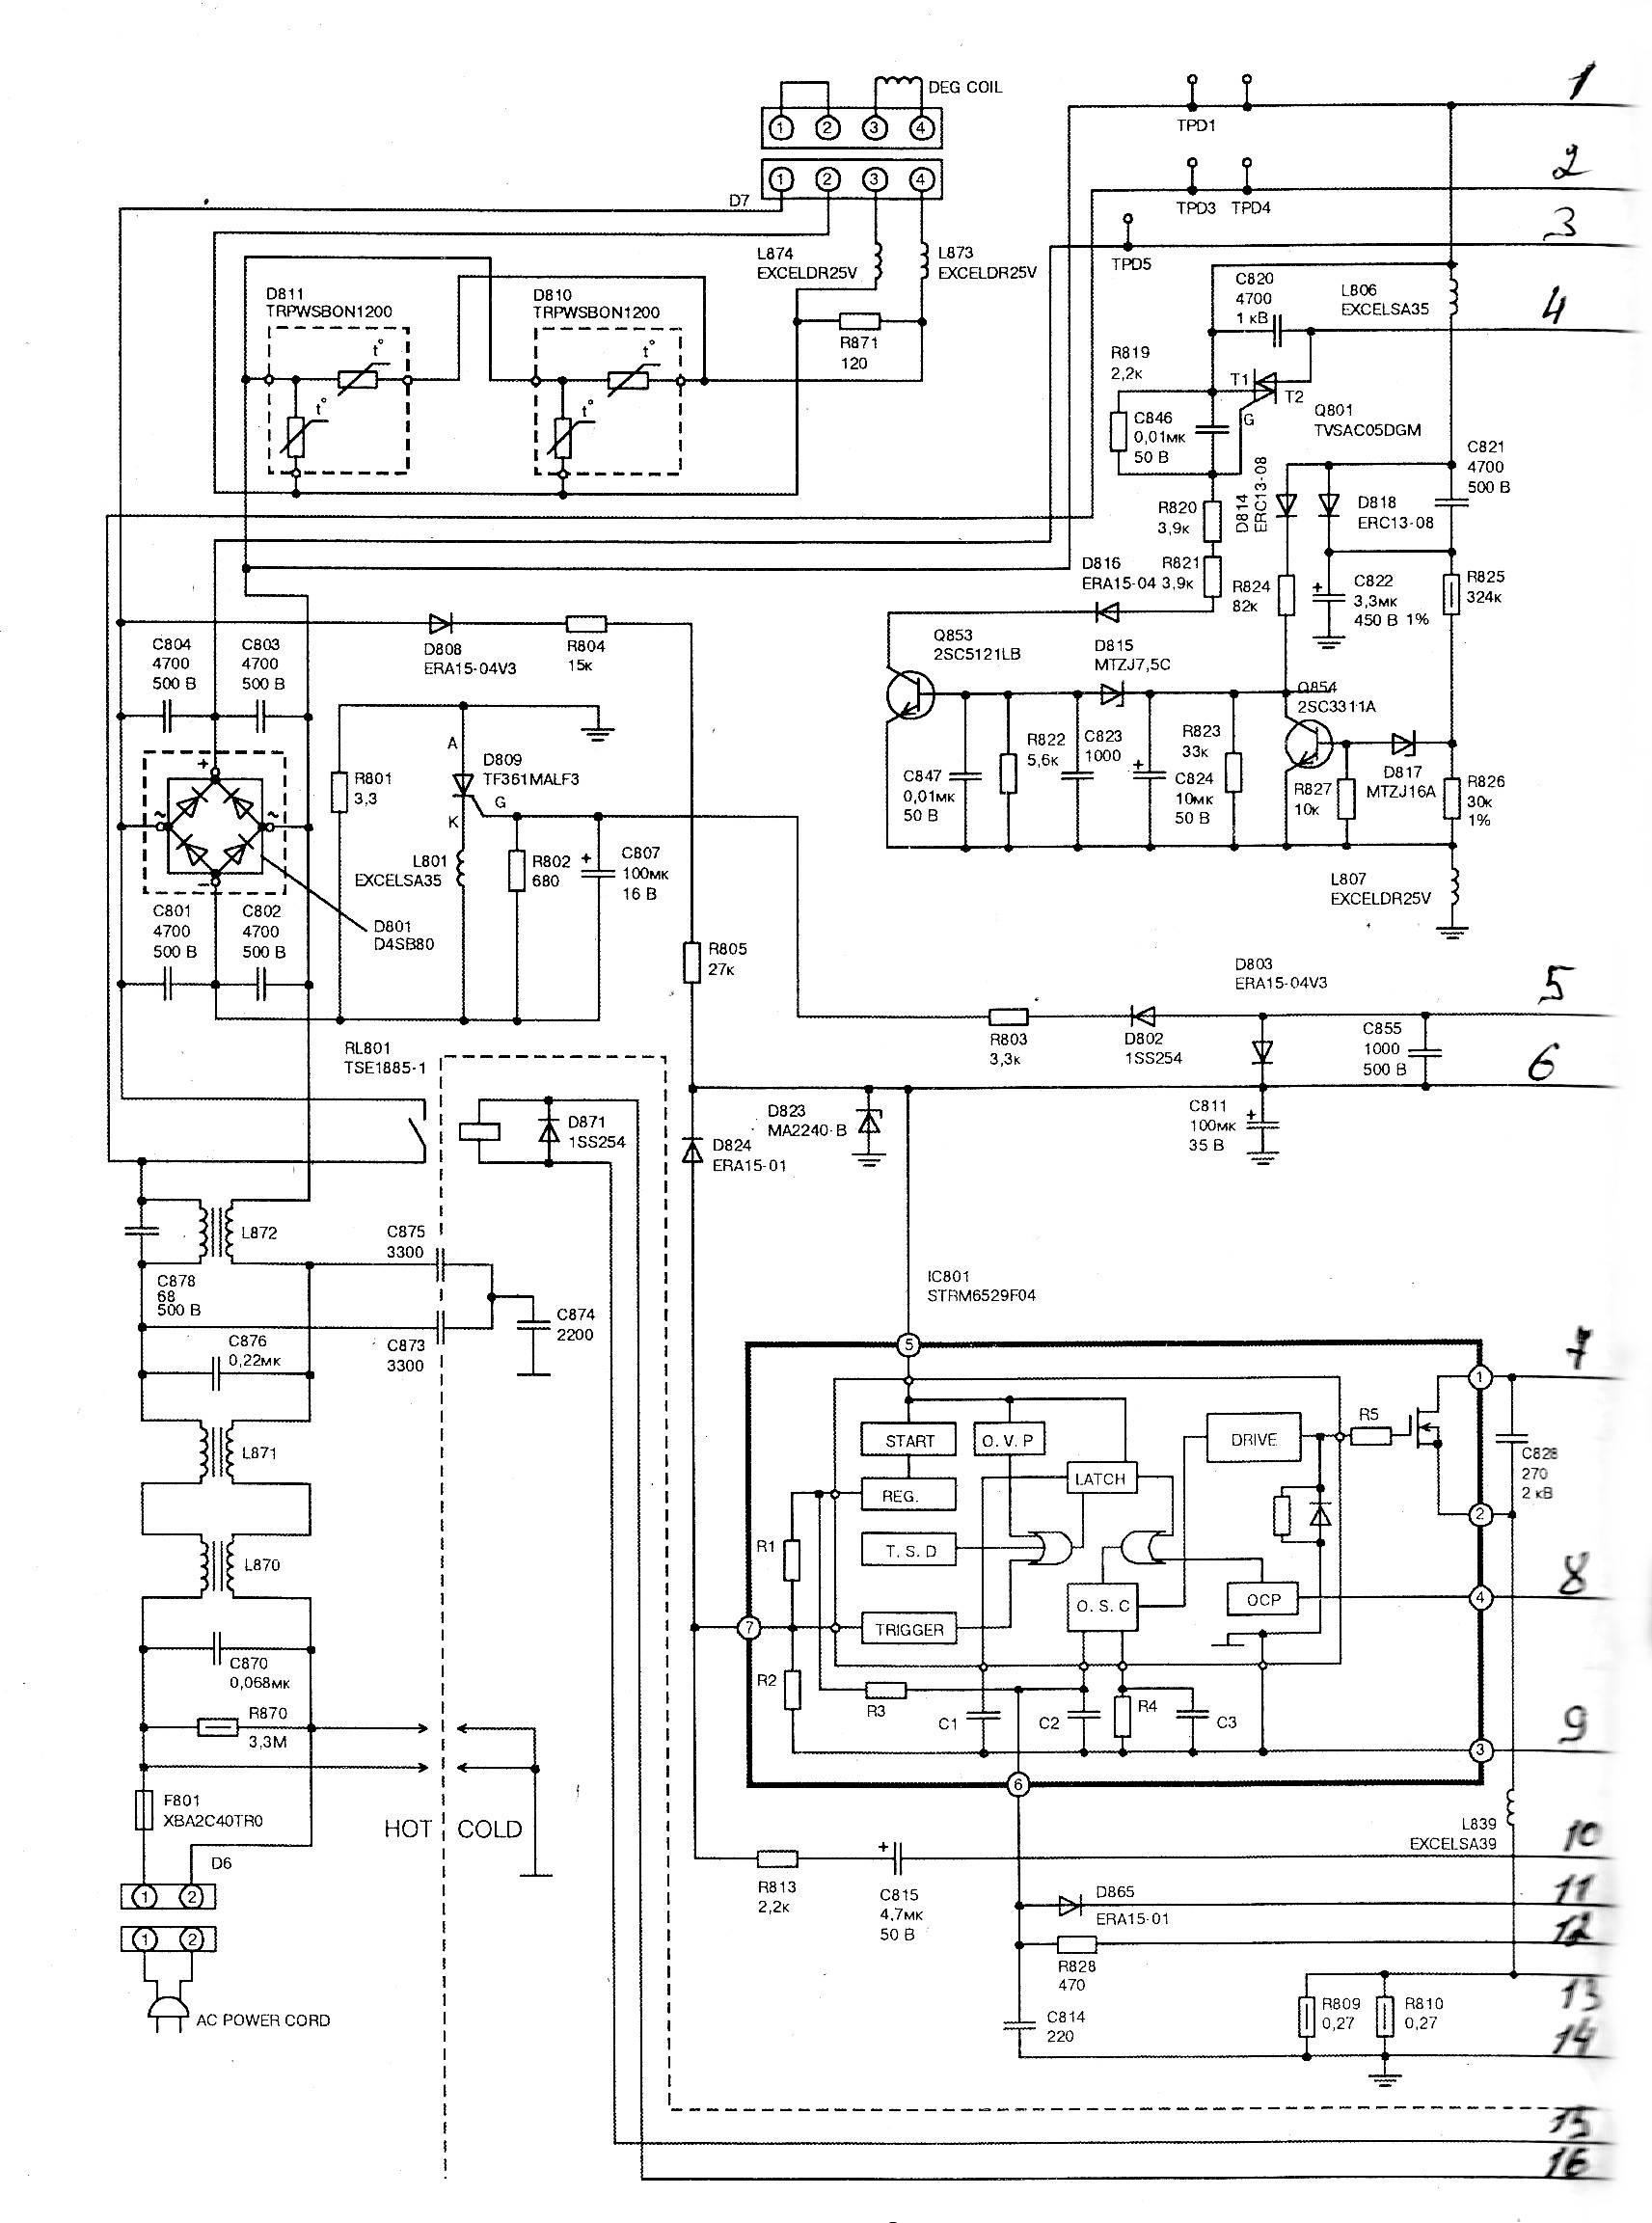 Схема блока питания телевизора панасоник тс-2150 rm